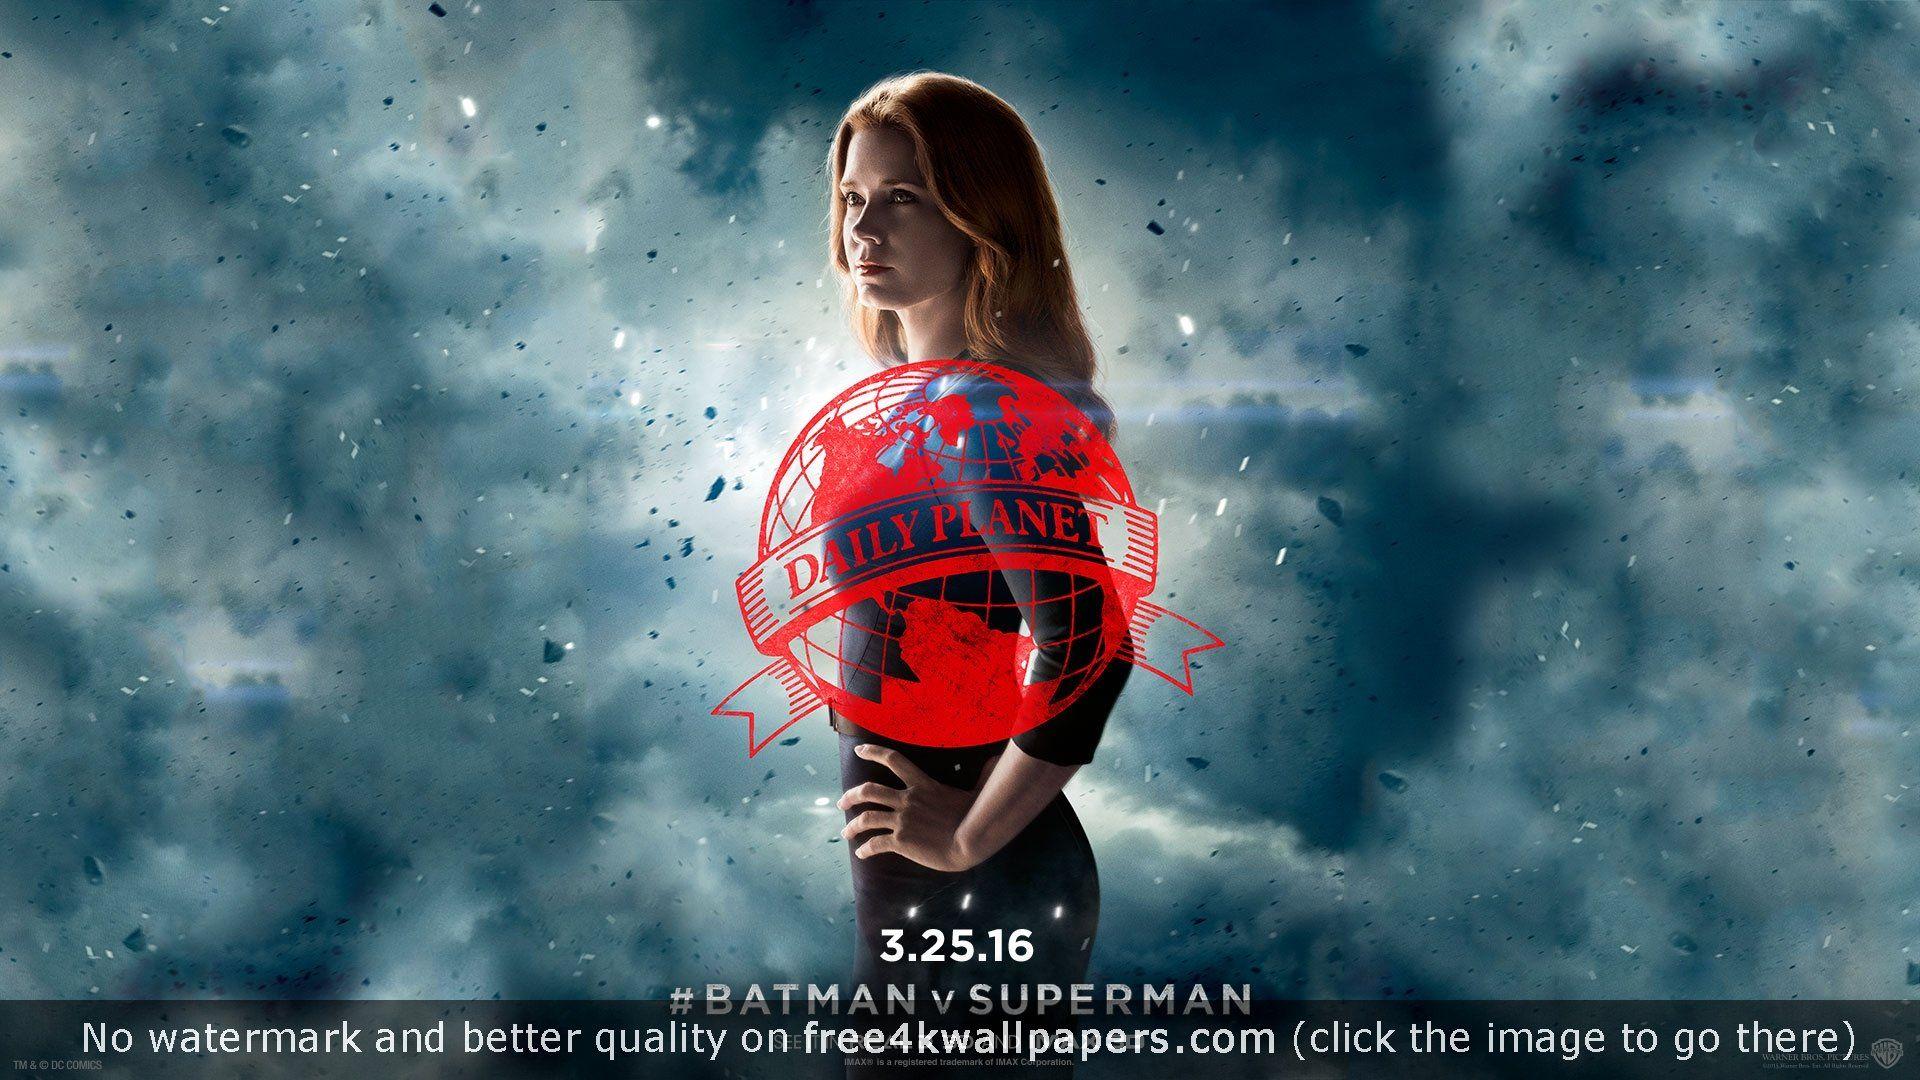 amy adams lois batman v superman 4k or hd wallpaper for your pc, mac